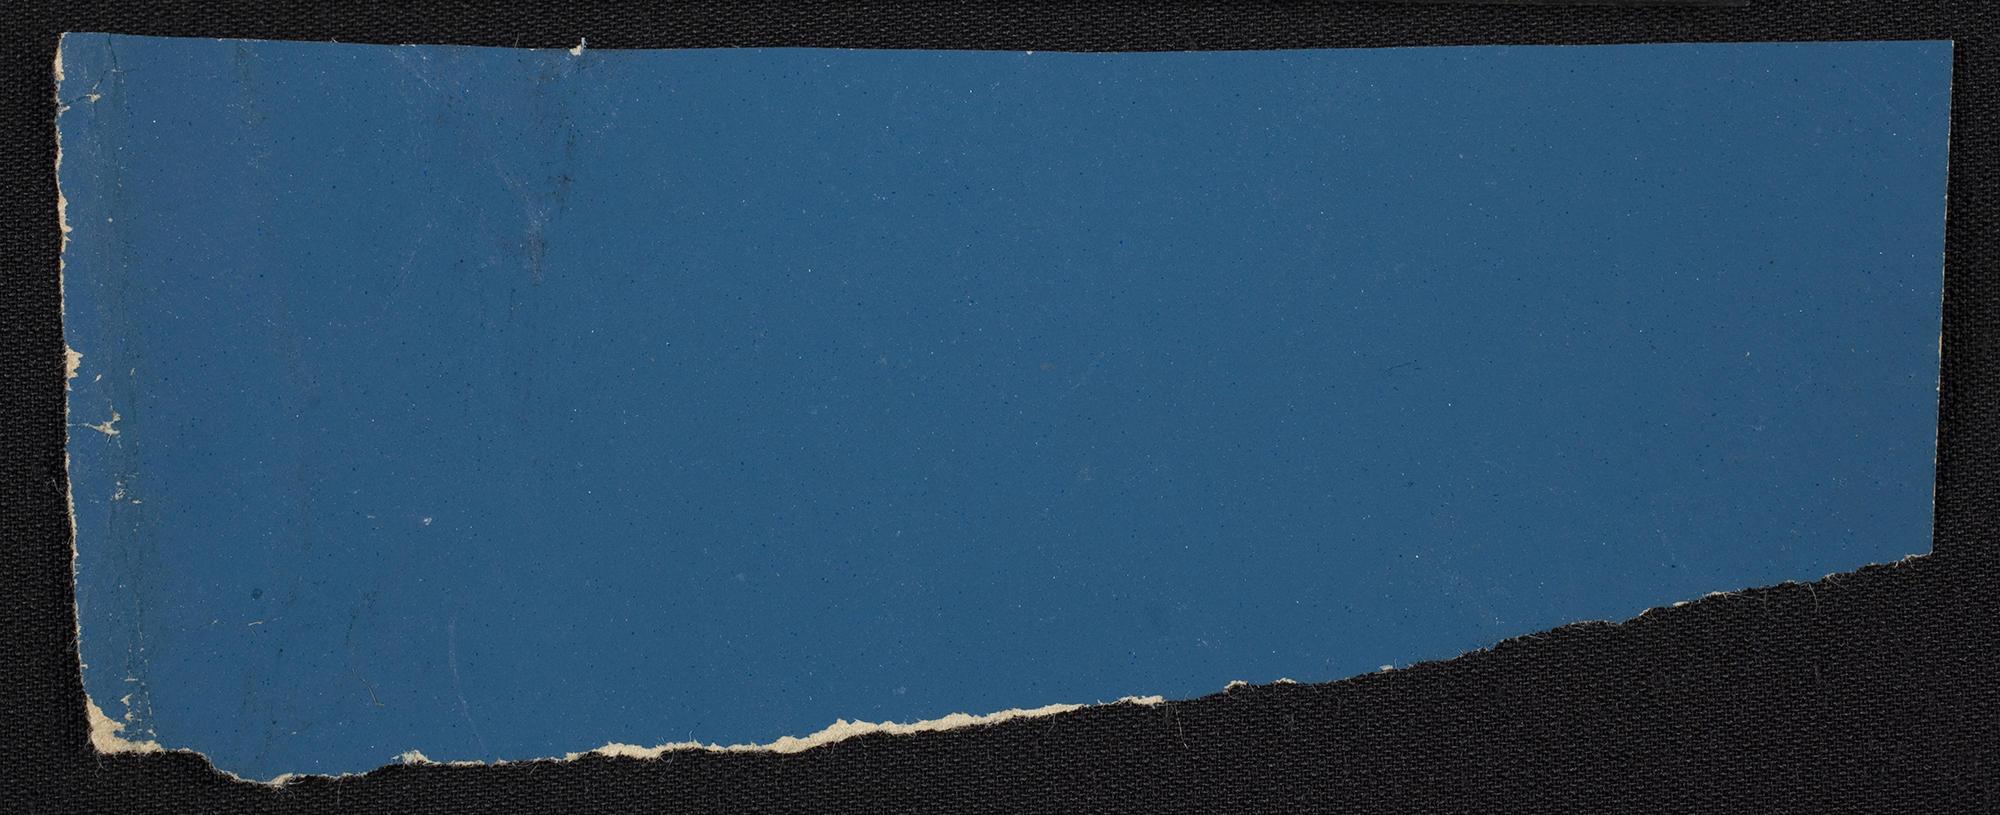 A piece of Bardin blue